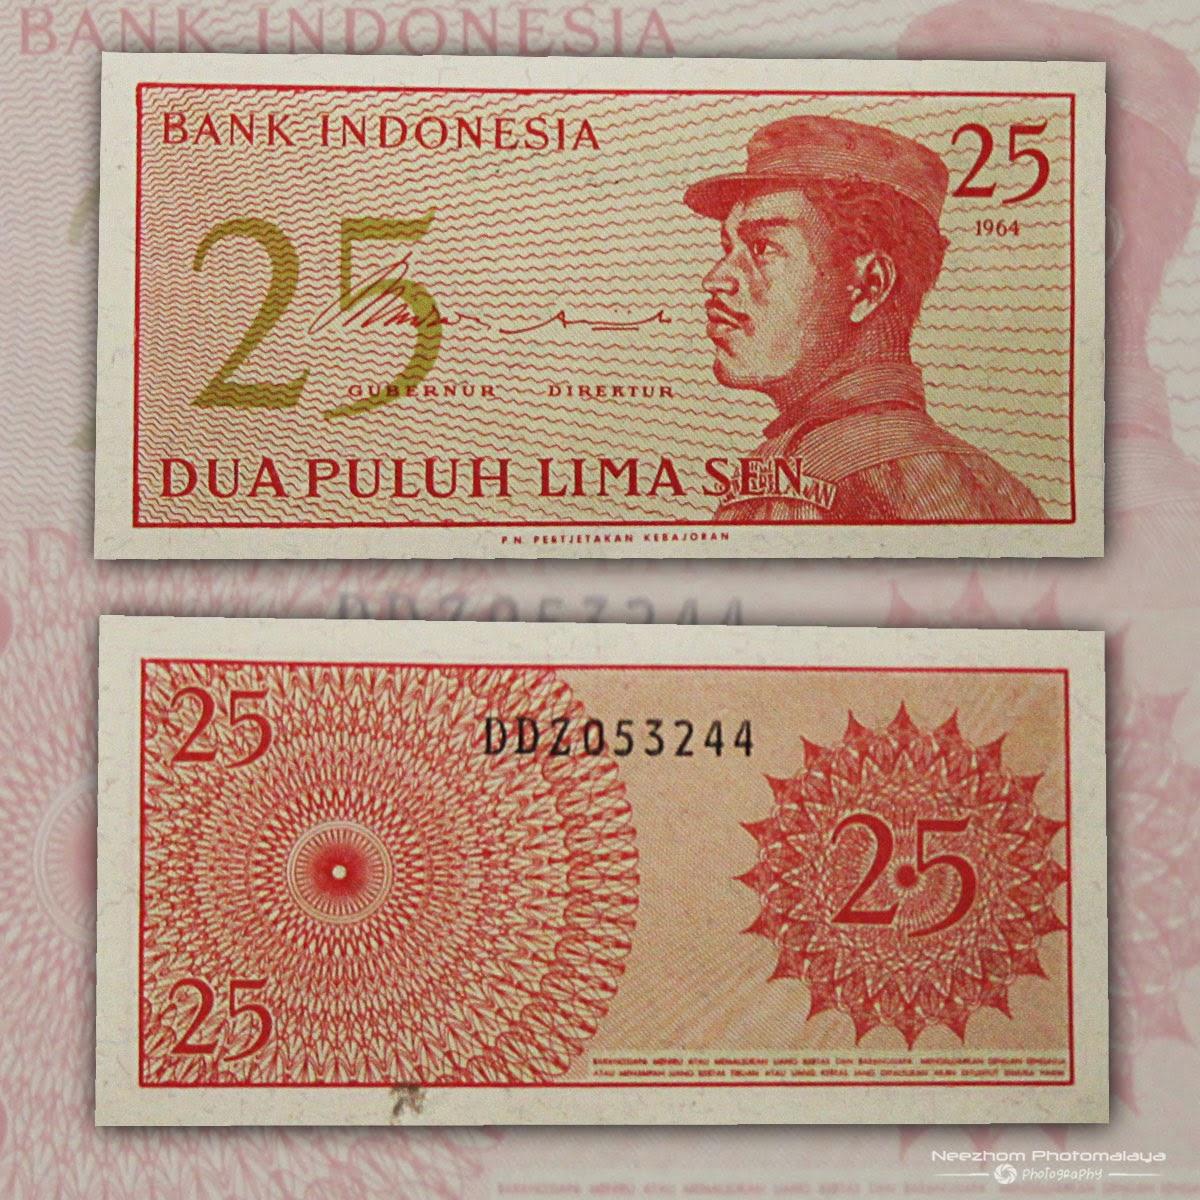 Duit kertas Indonesia 25 Sen tahun 1964